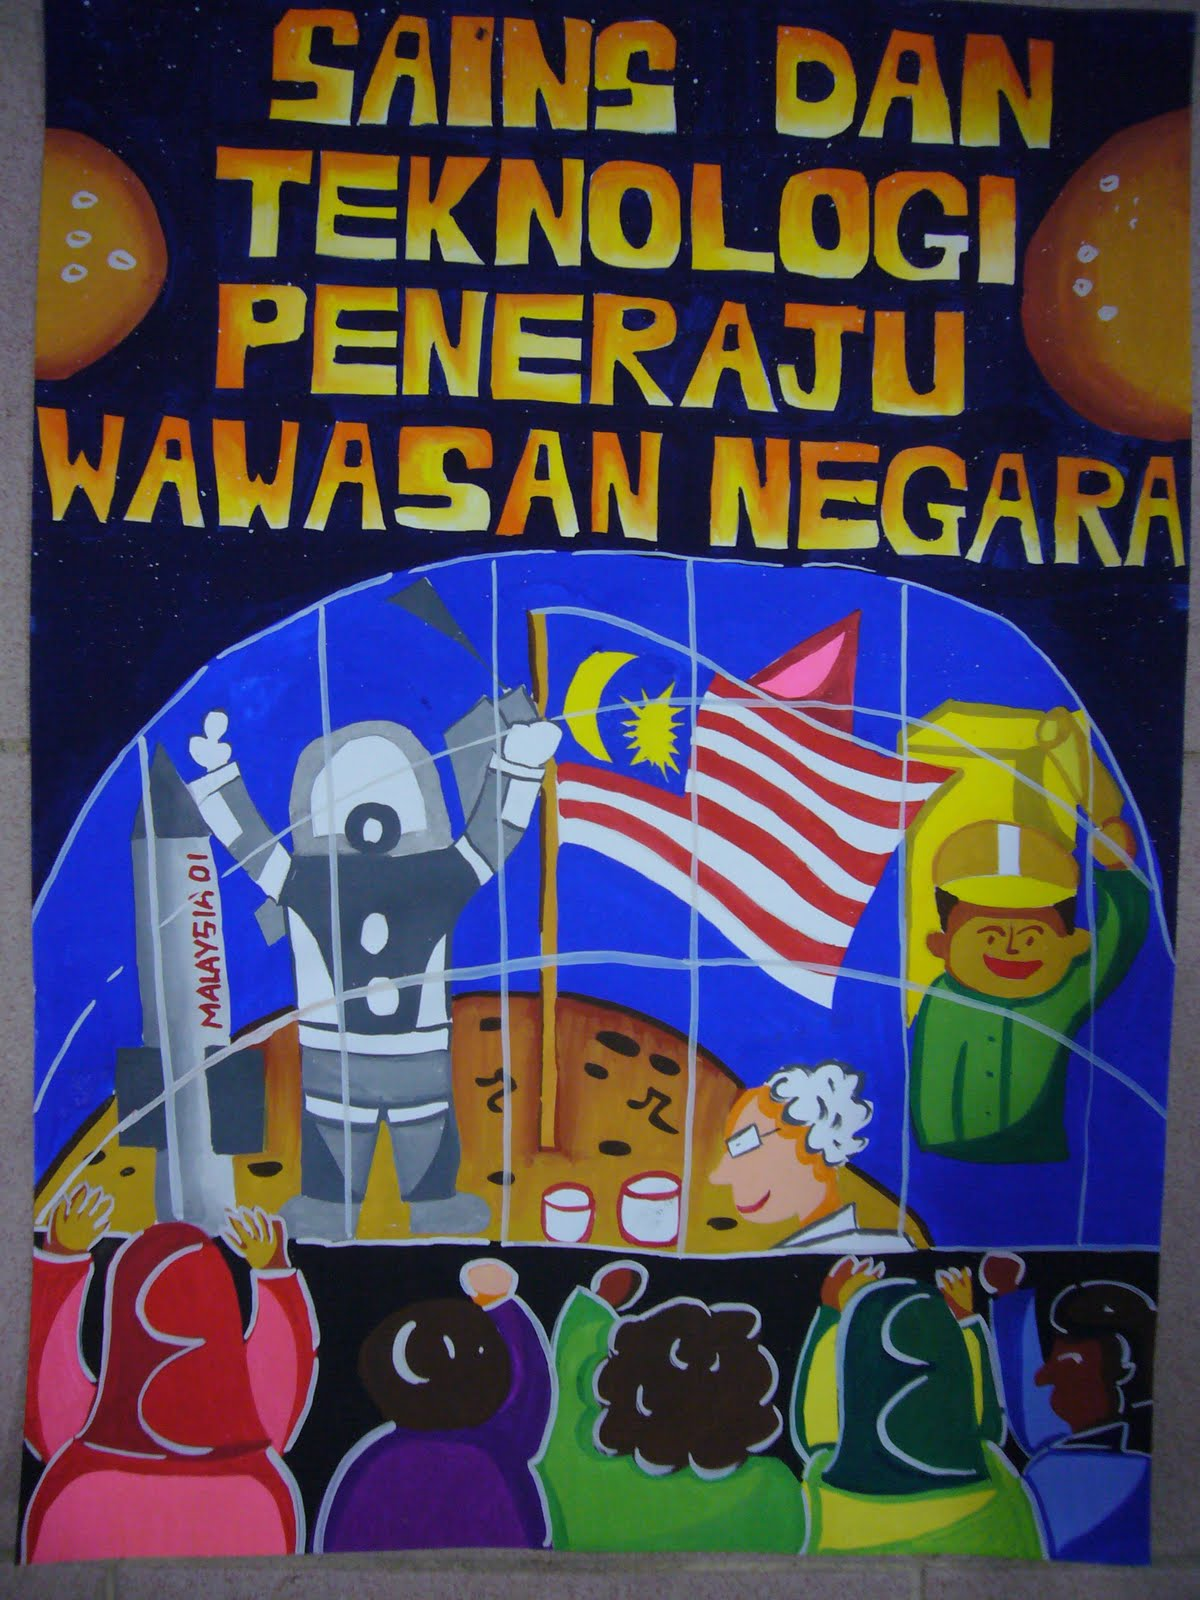 "Kalimat Slogan Pendidikan Contoh Kata Kata Slogan Kesehatan Embun Syurga 21 Feb 2011 жЋІз164;єжќї гѓ""гѓіг'181;гѓдєЂжњ"